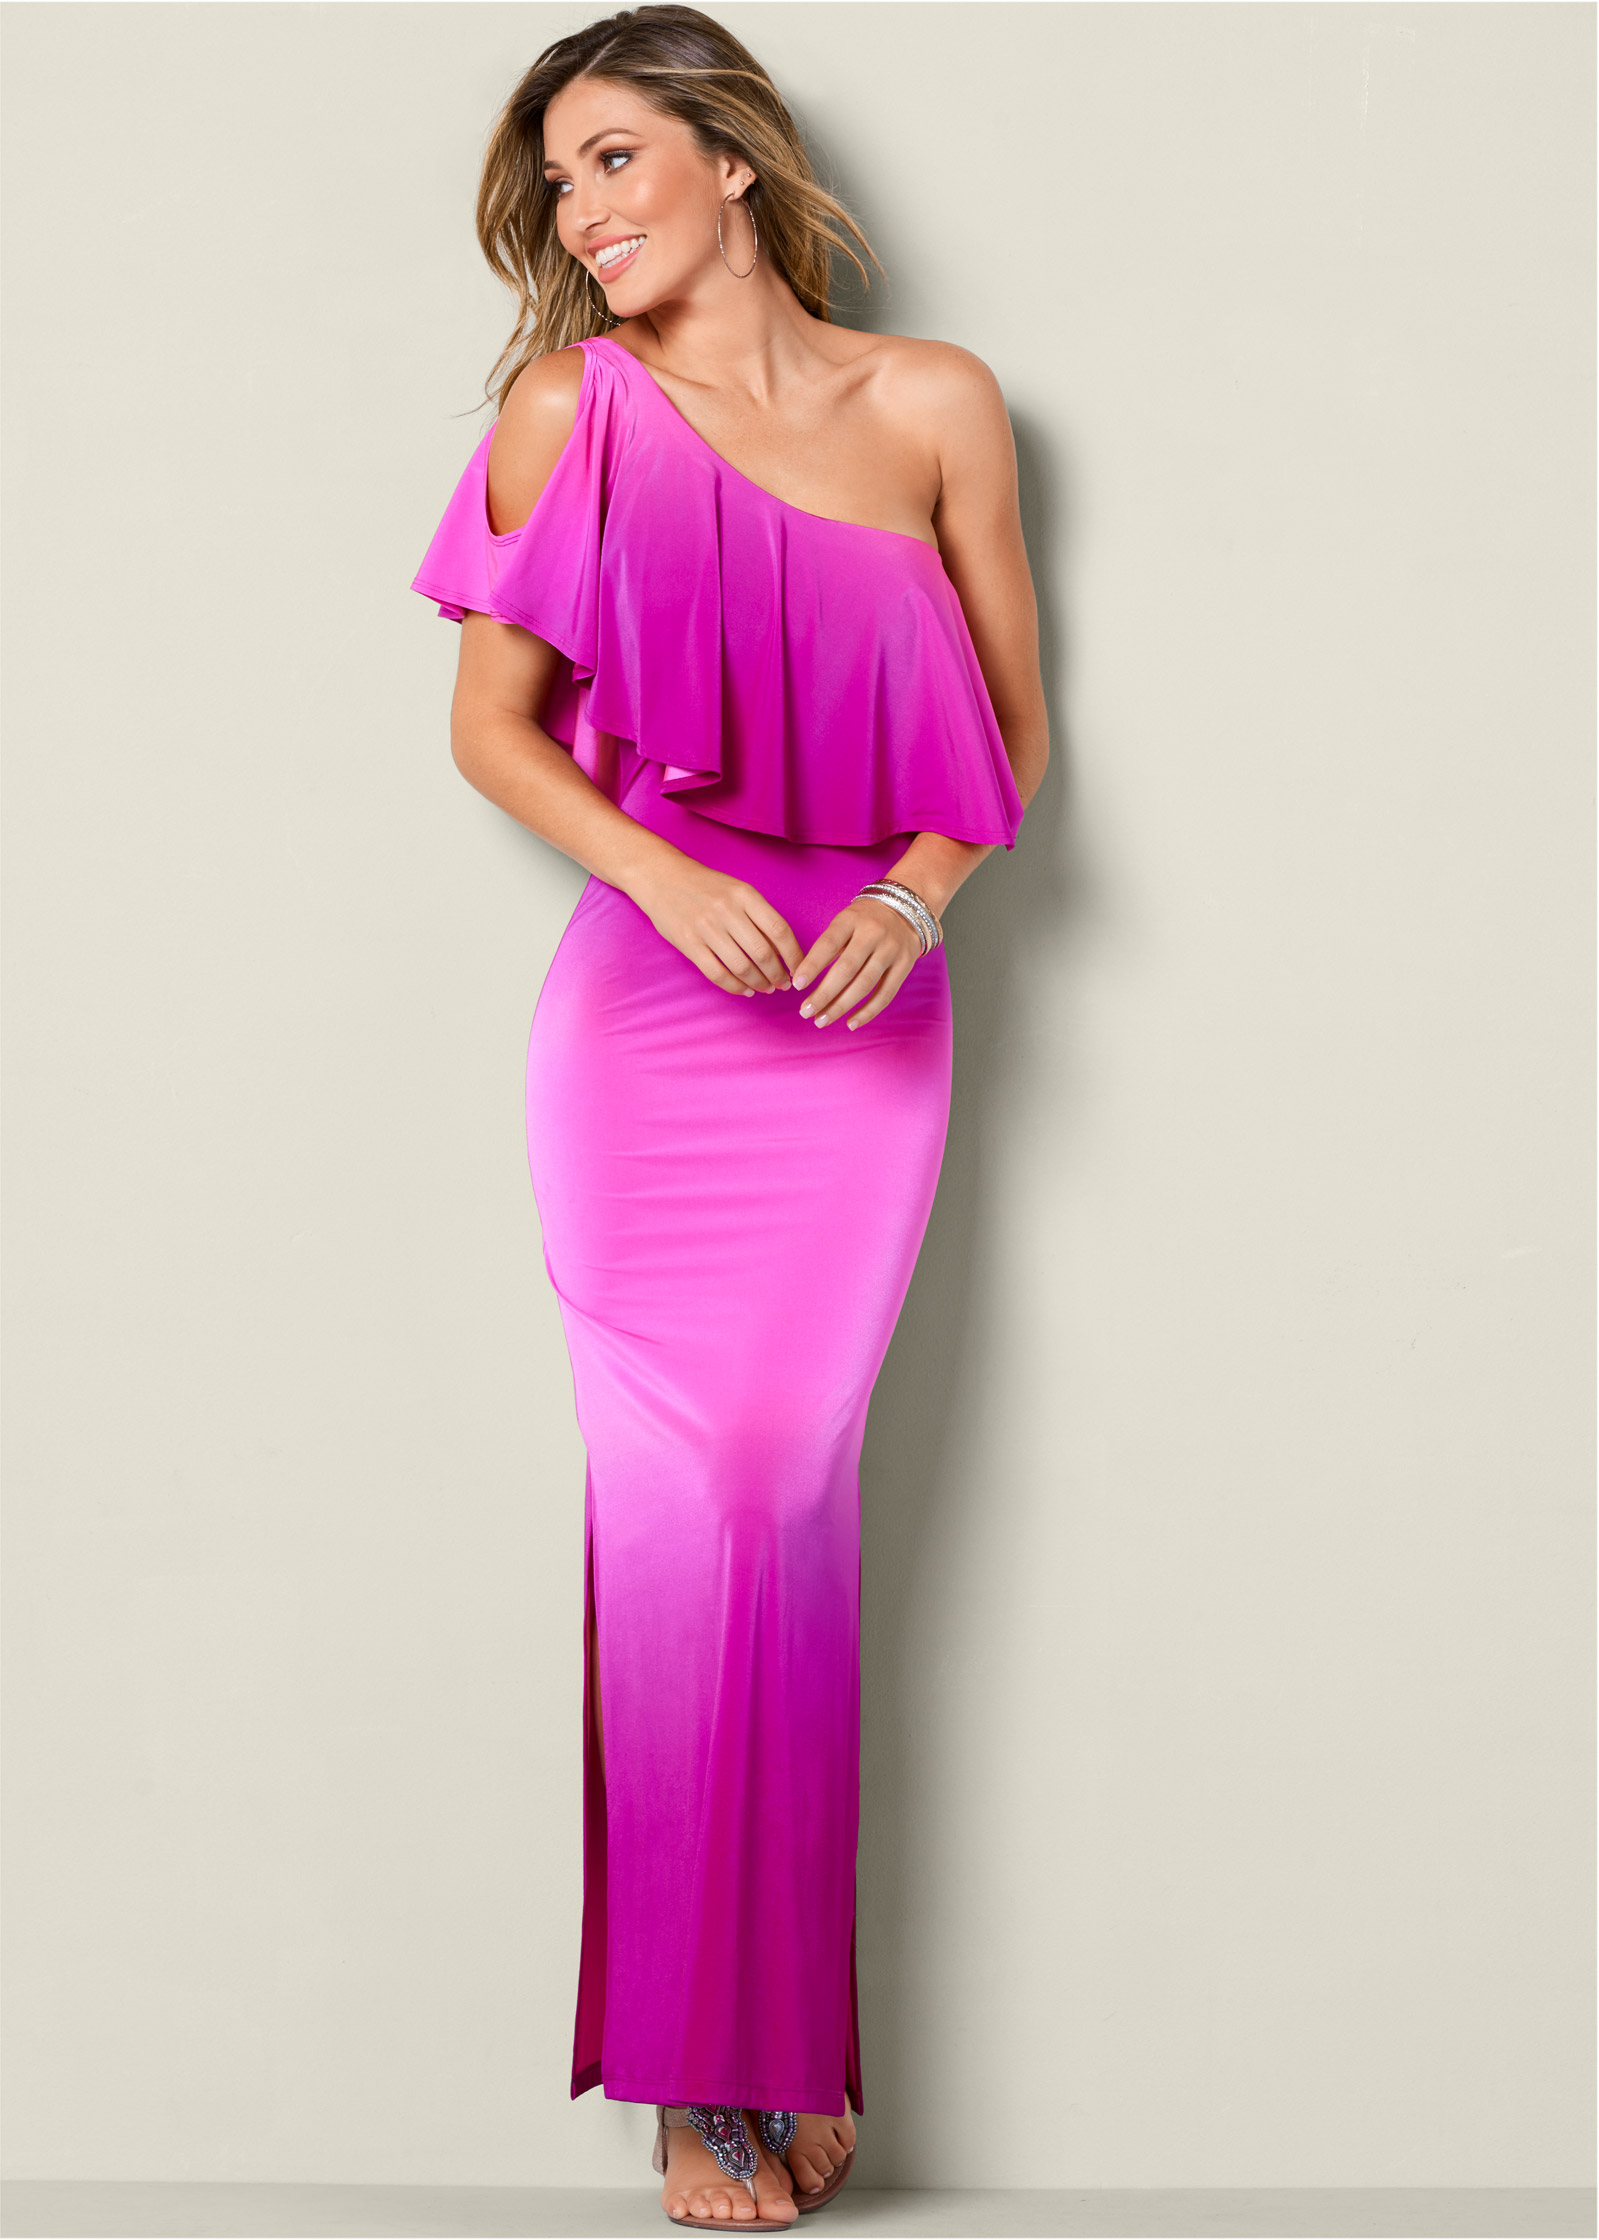 OMBRE MAXI DRESS in Fuschia Multi | VENUS